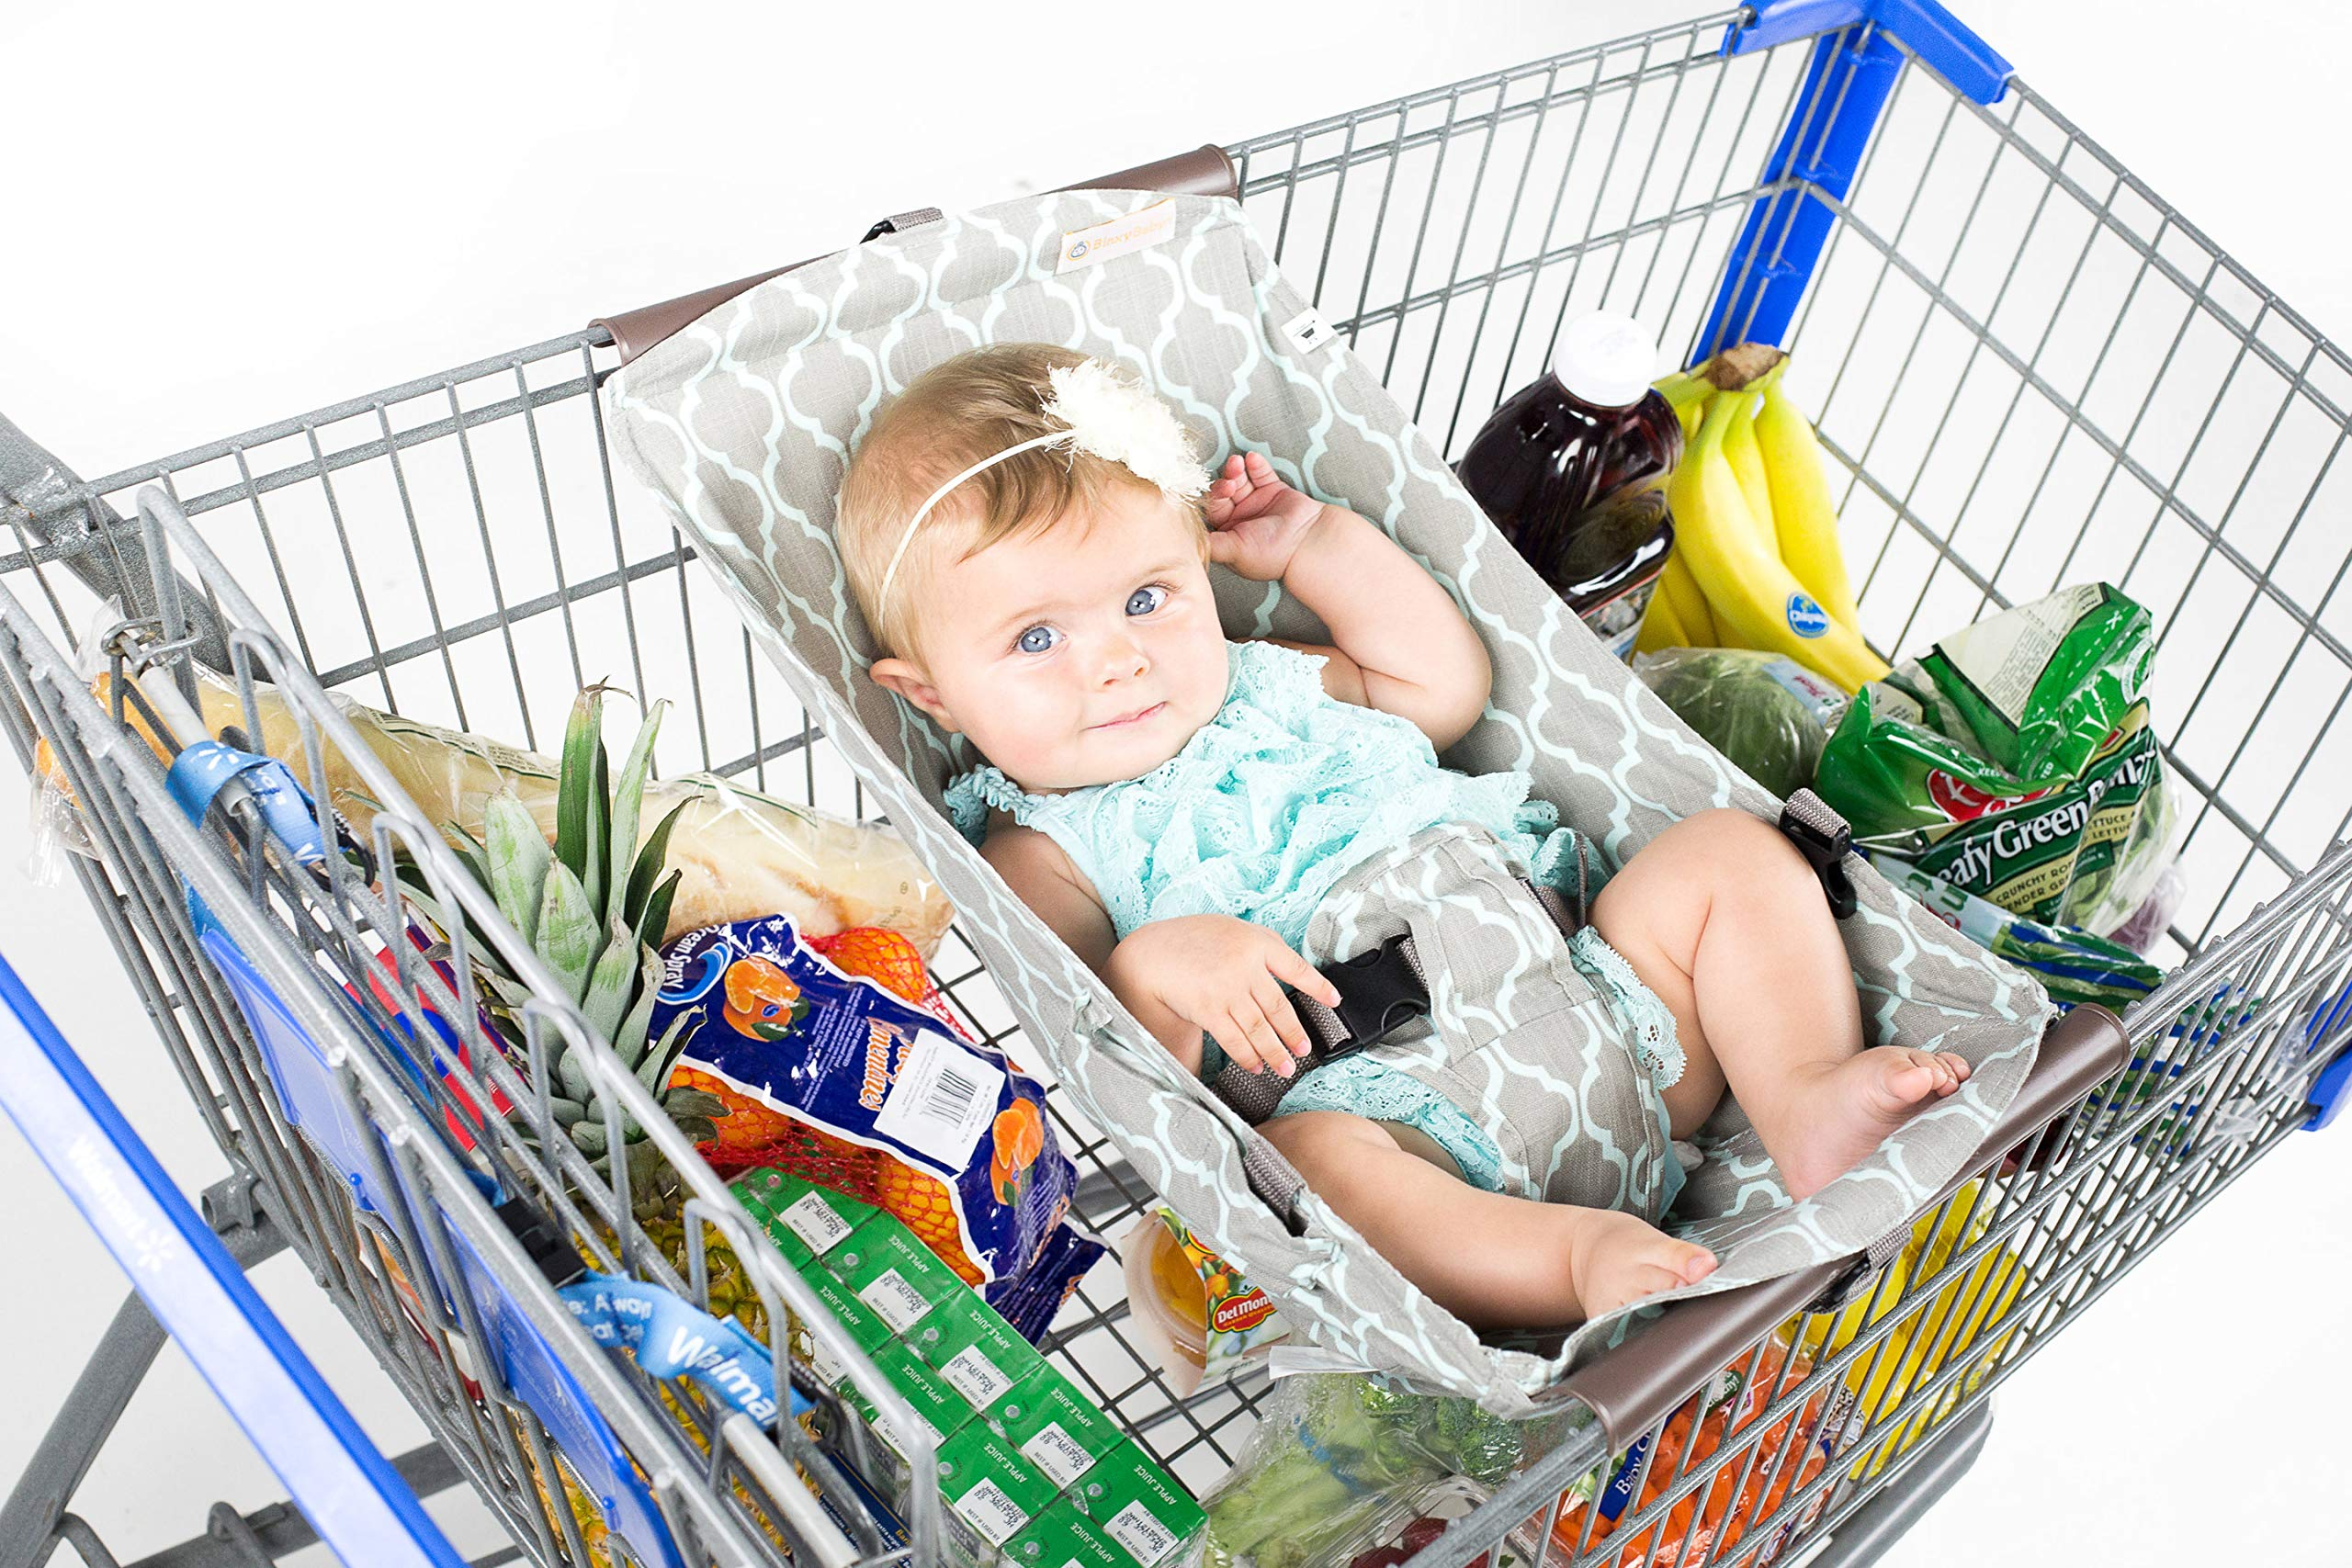 BINXY BABY Shopping Cart Hammock | The Original | Ergonomic Infant Carrier + Positioner by Binxy Baby (Image #1)